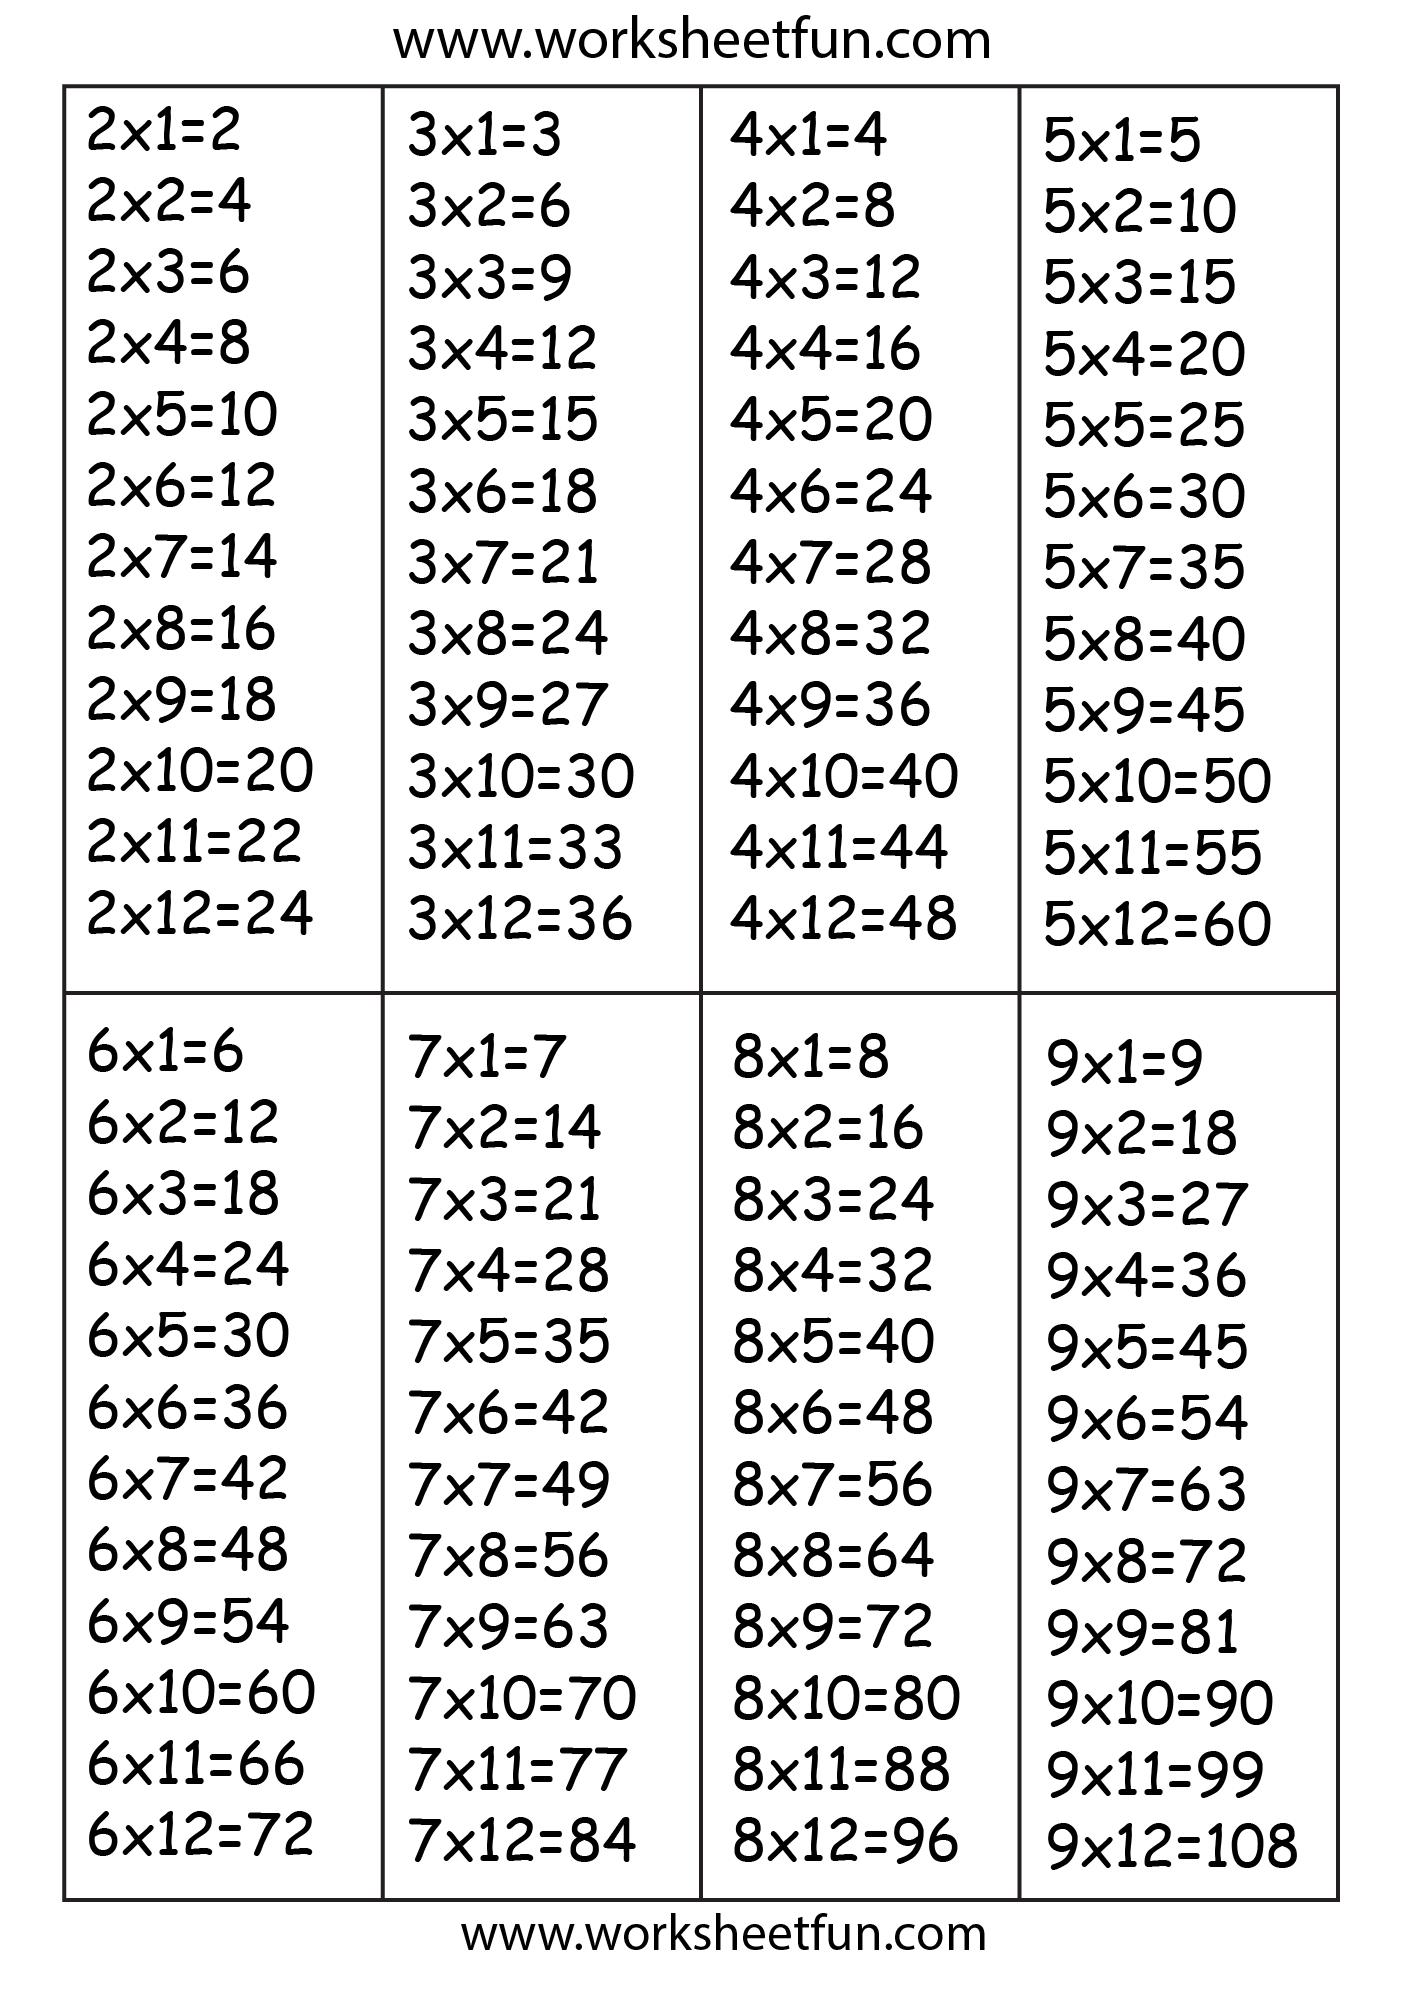 Times Table – 2 Times Table / Free Printable Worksheets – Worksheetfun   Multiplication Table Worksheets Printable